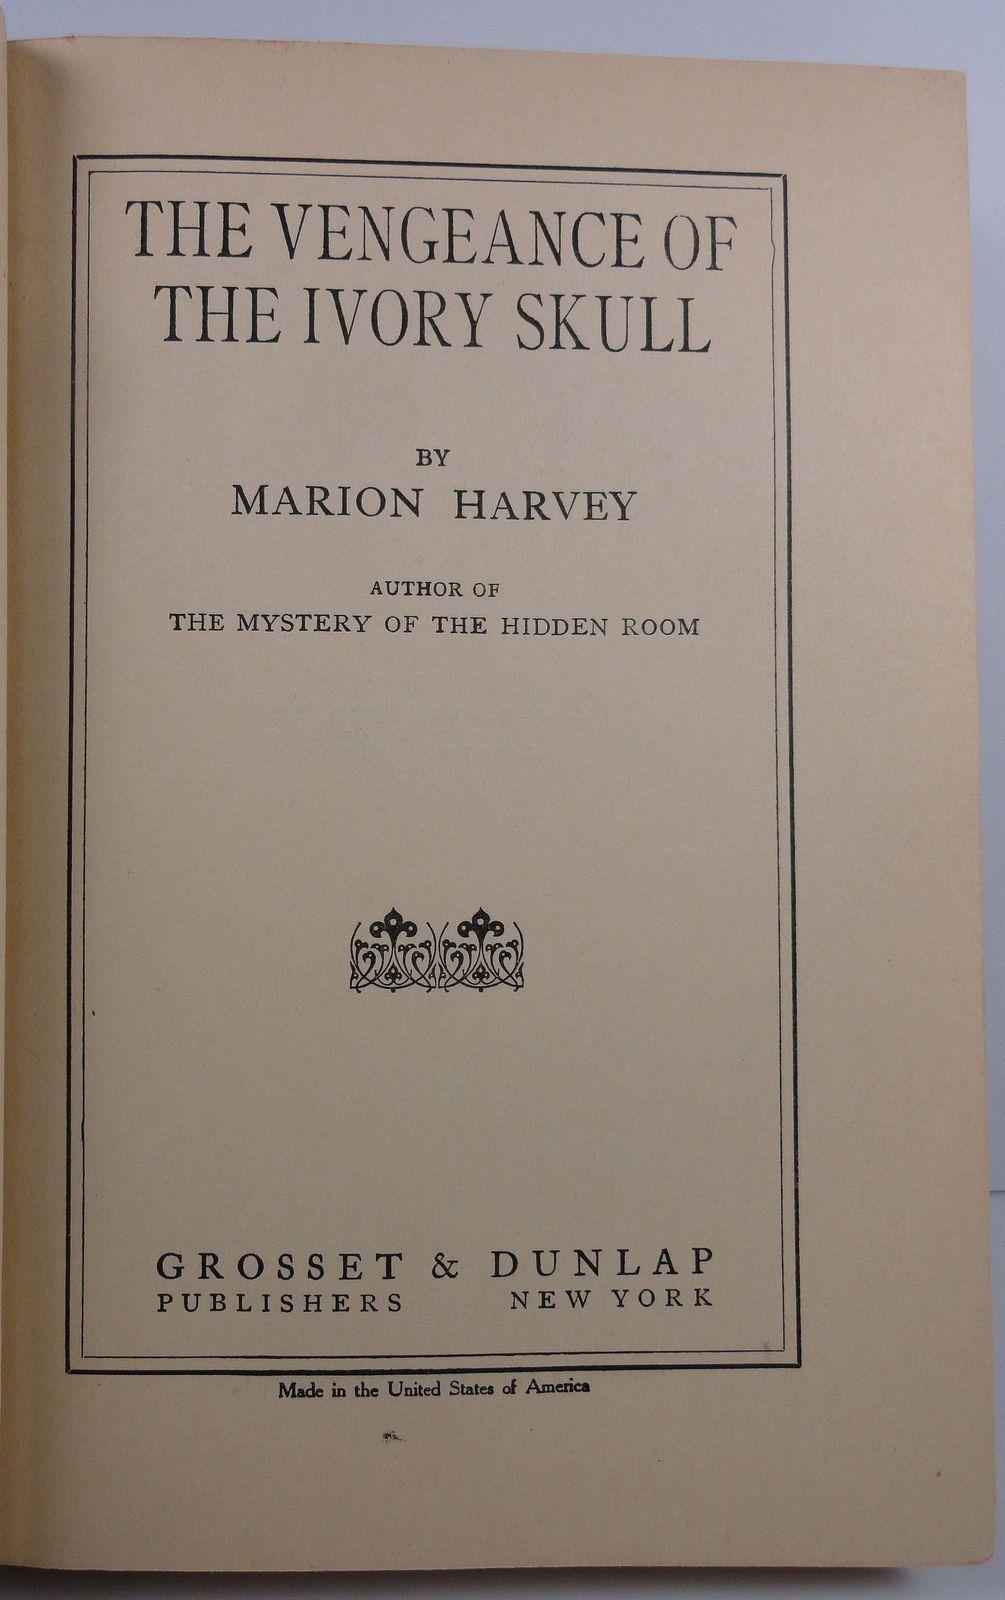 The Vengeance of the Ivory Skull by Marion Harvey 1923